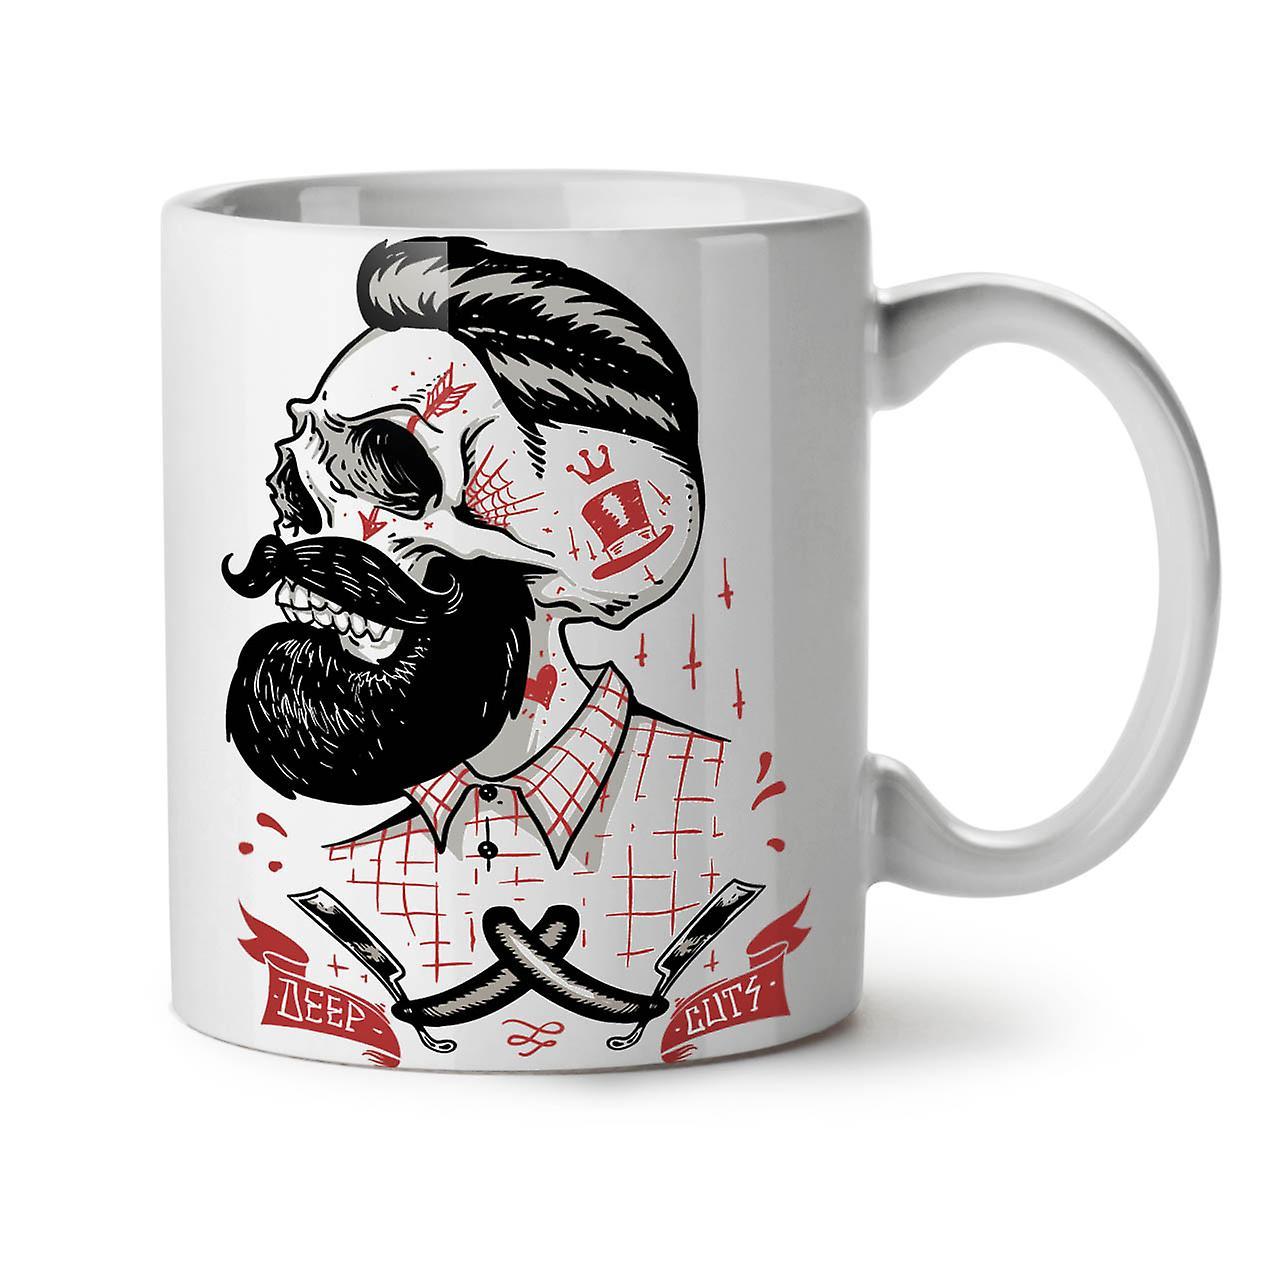 New Ceramic Mug Skull Tea 11 Coffee Hippie Beard OzWellcoda White fIY76gbyv